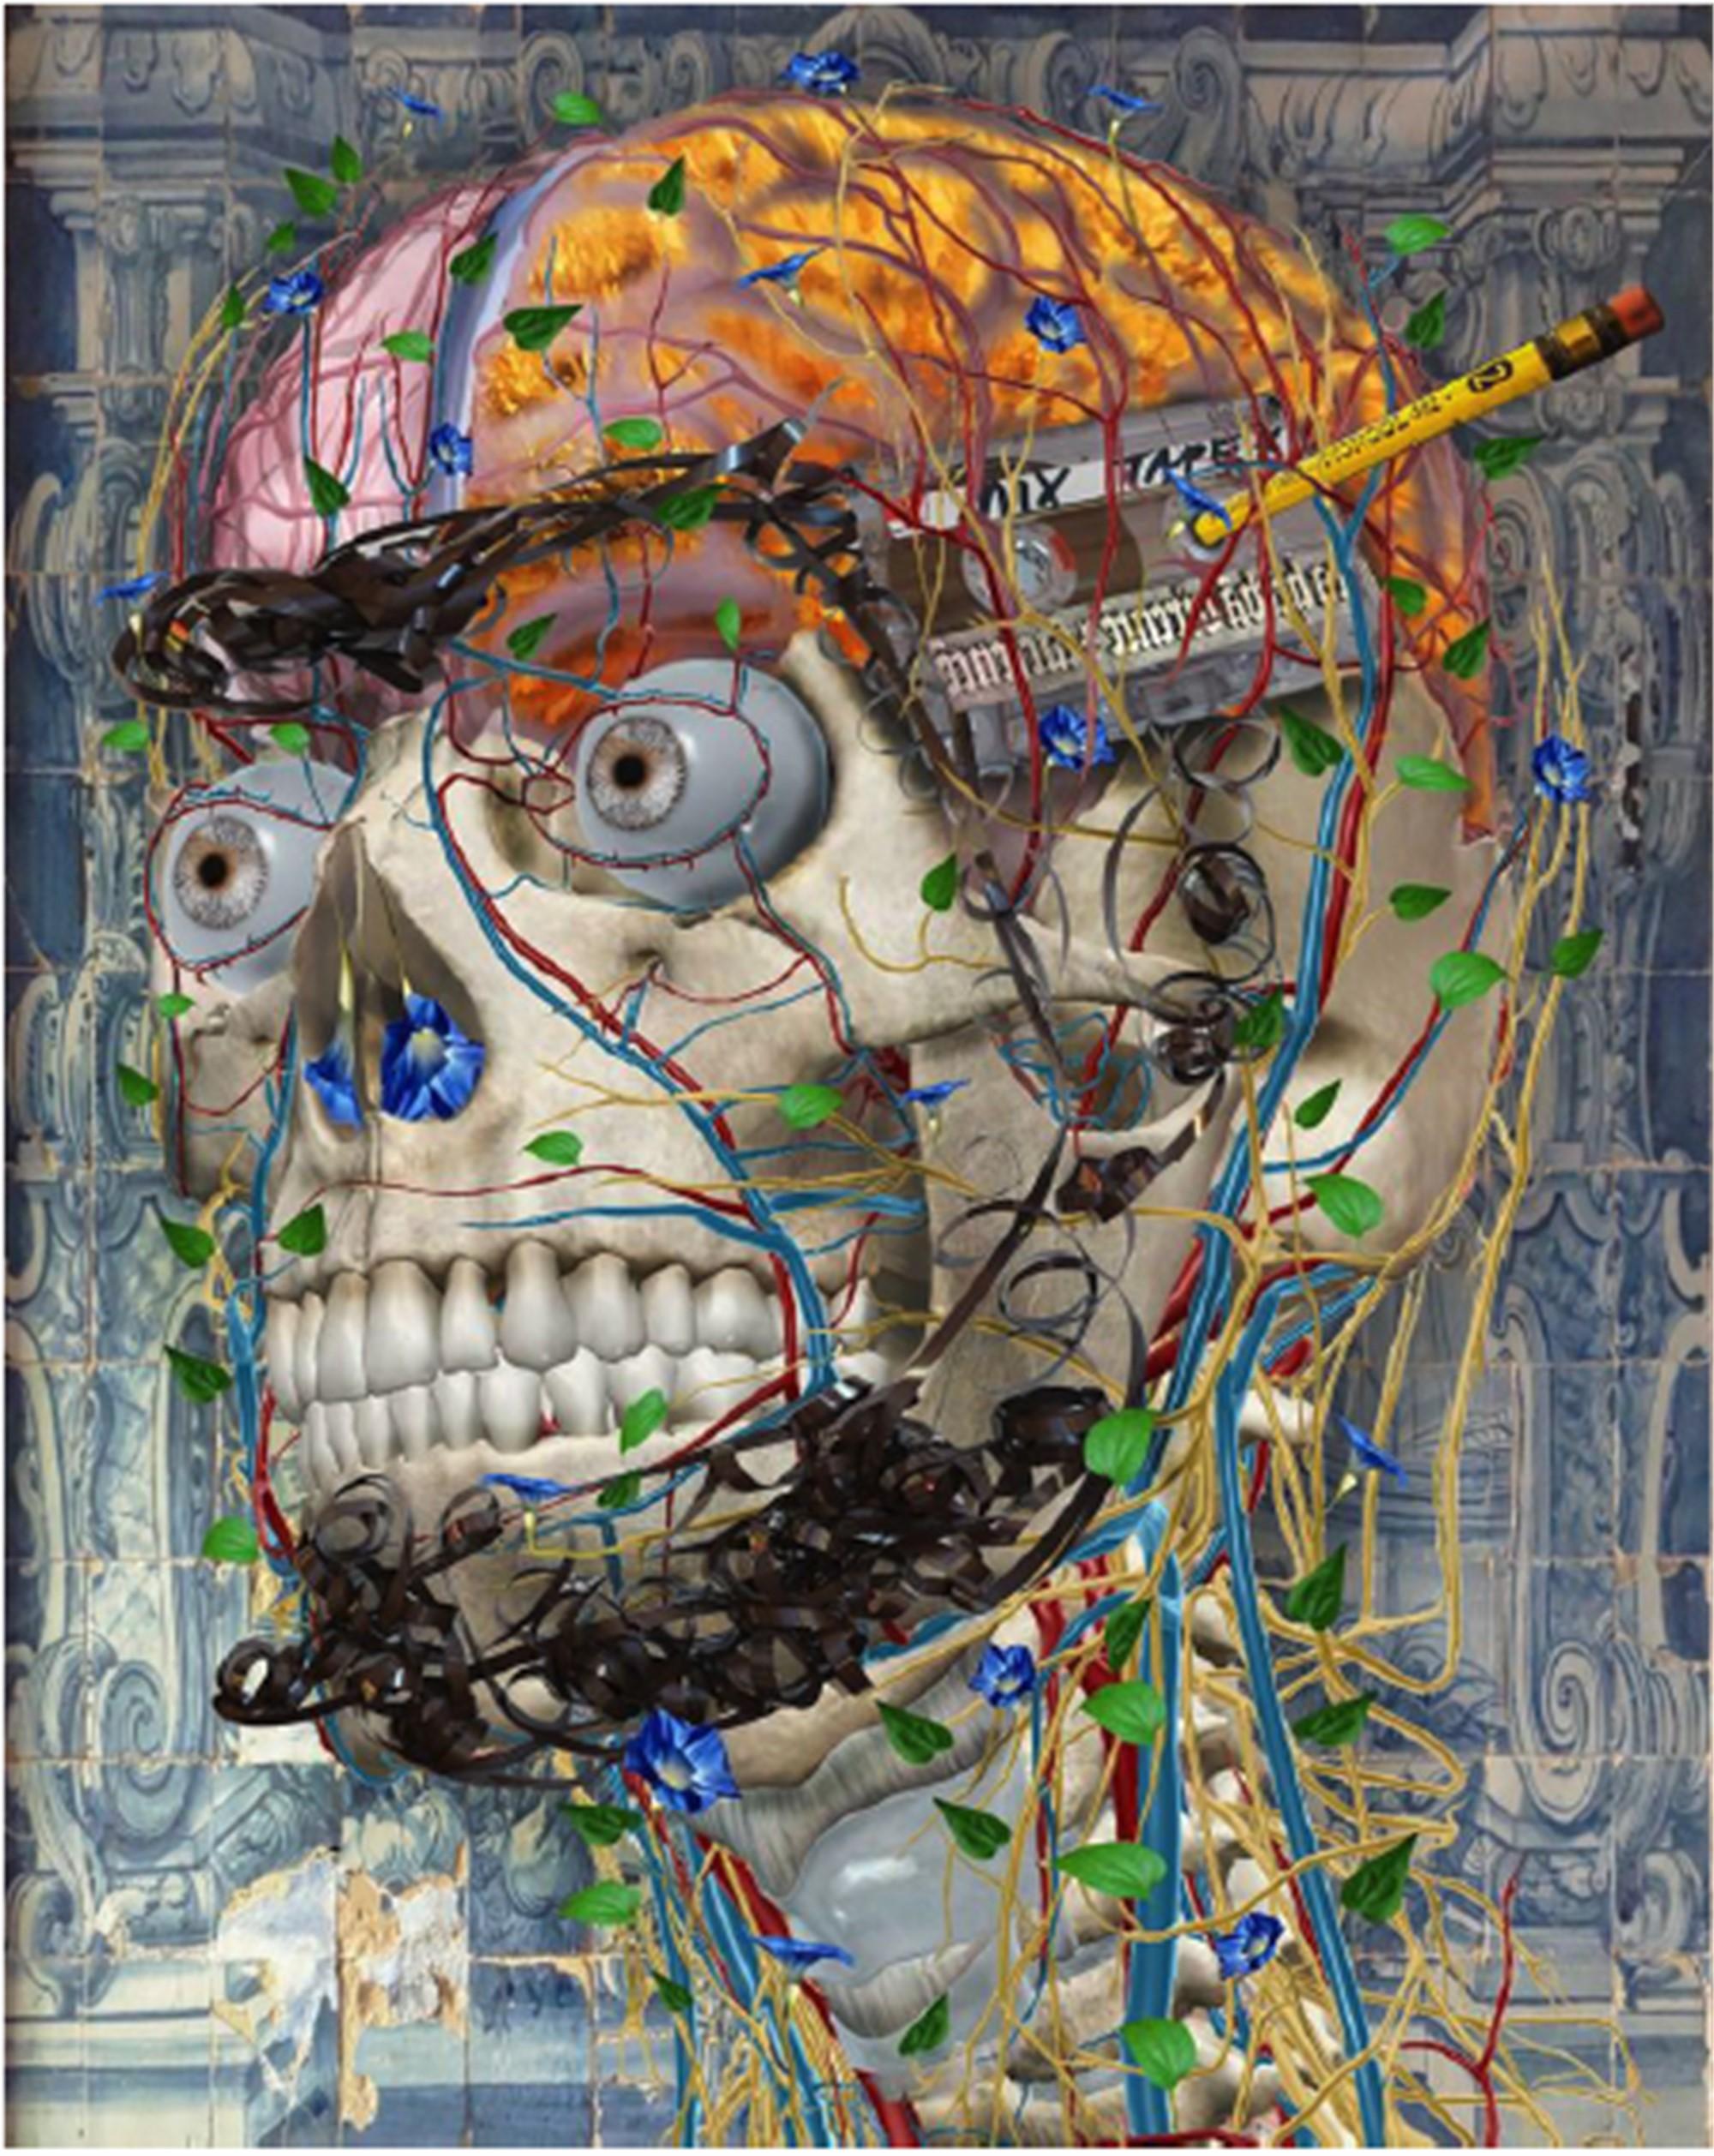 Transdifferentiation III by Einar and Jamex de la Torre